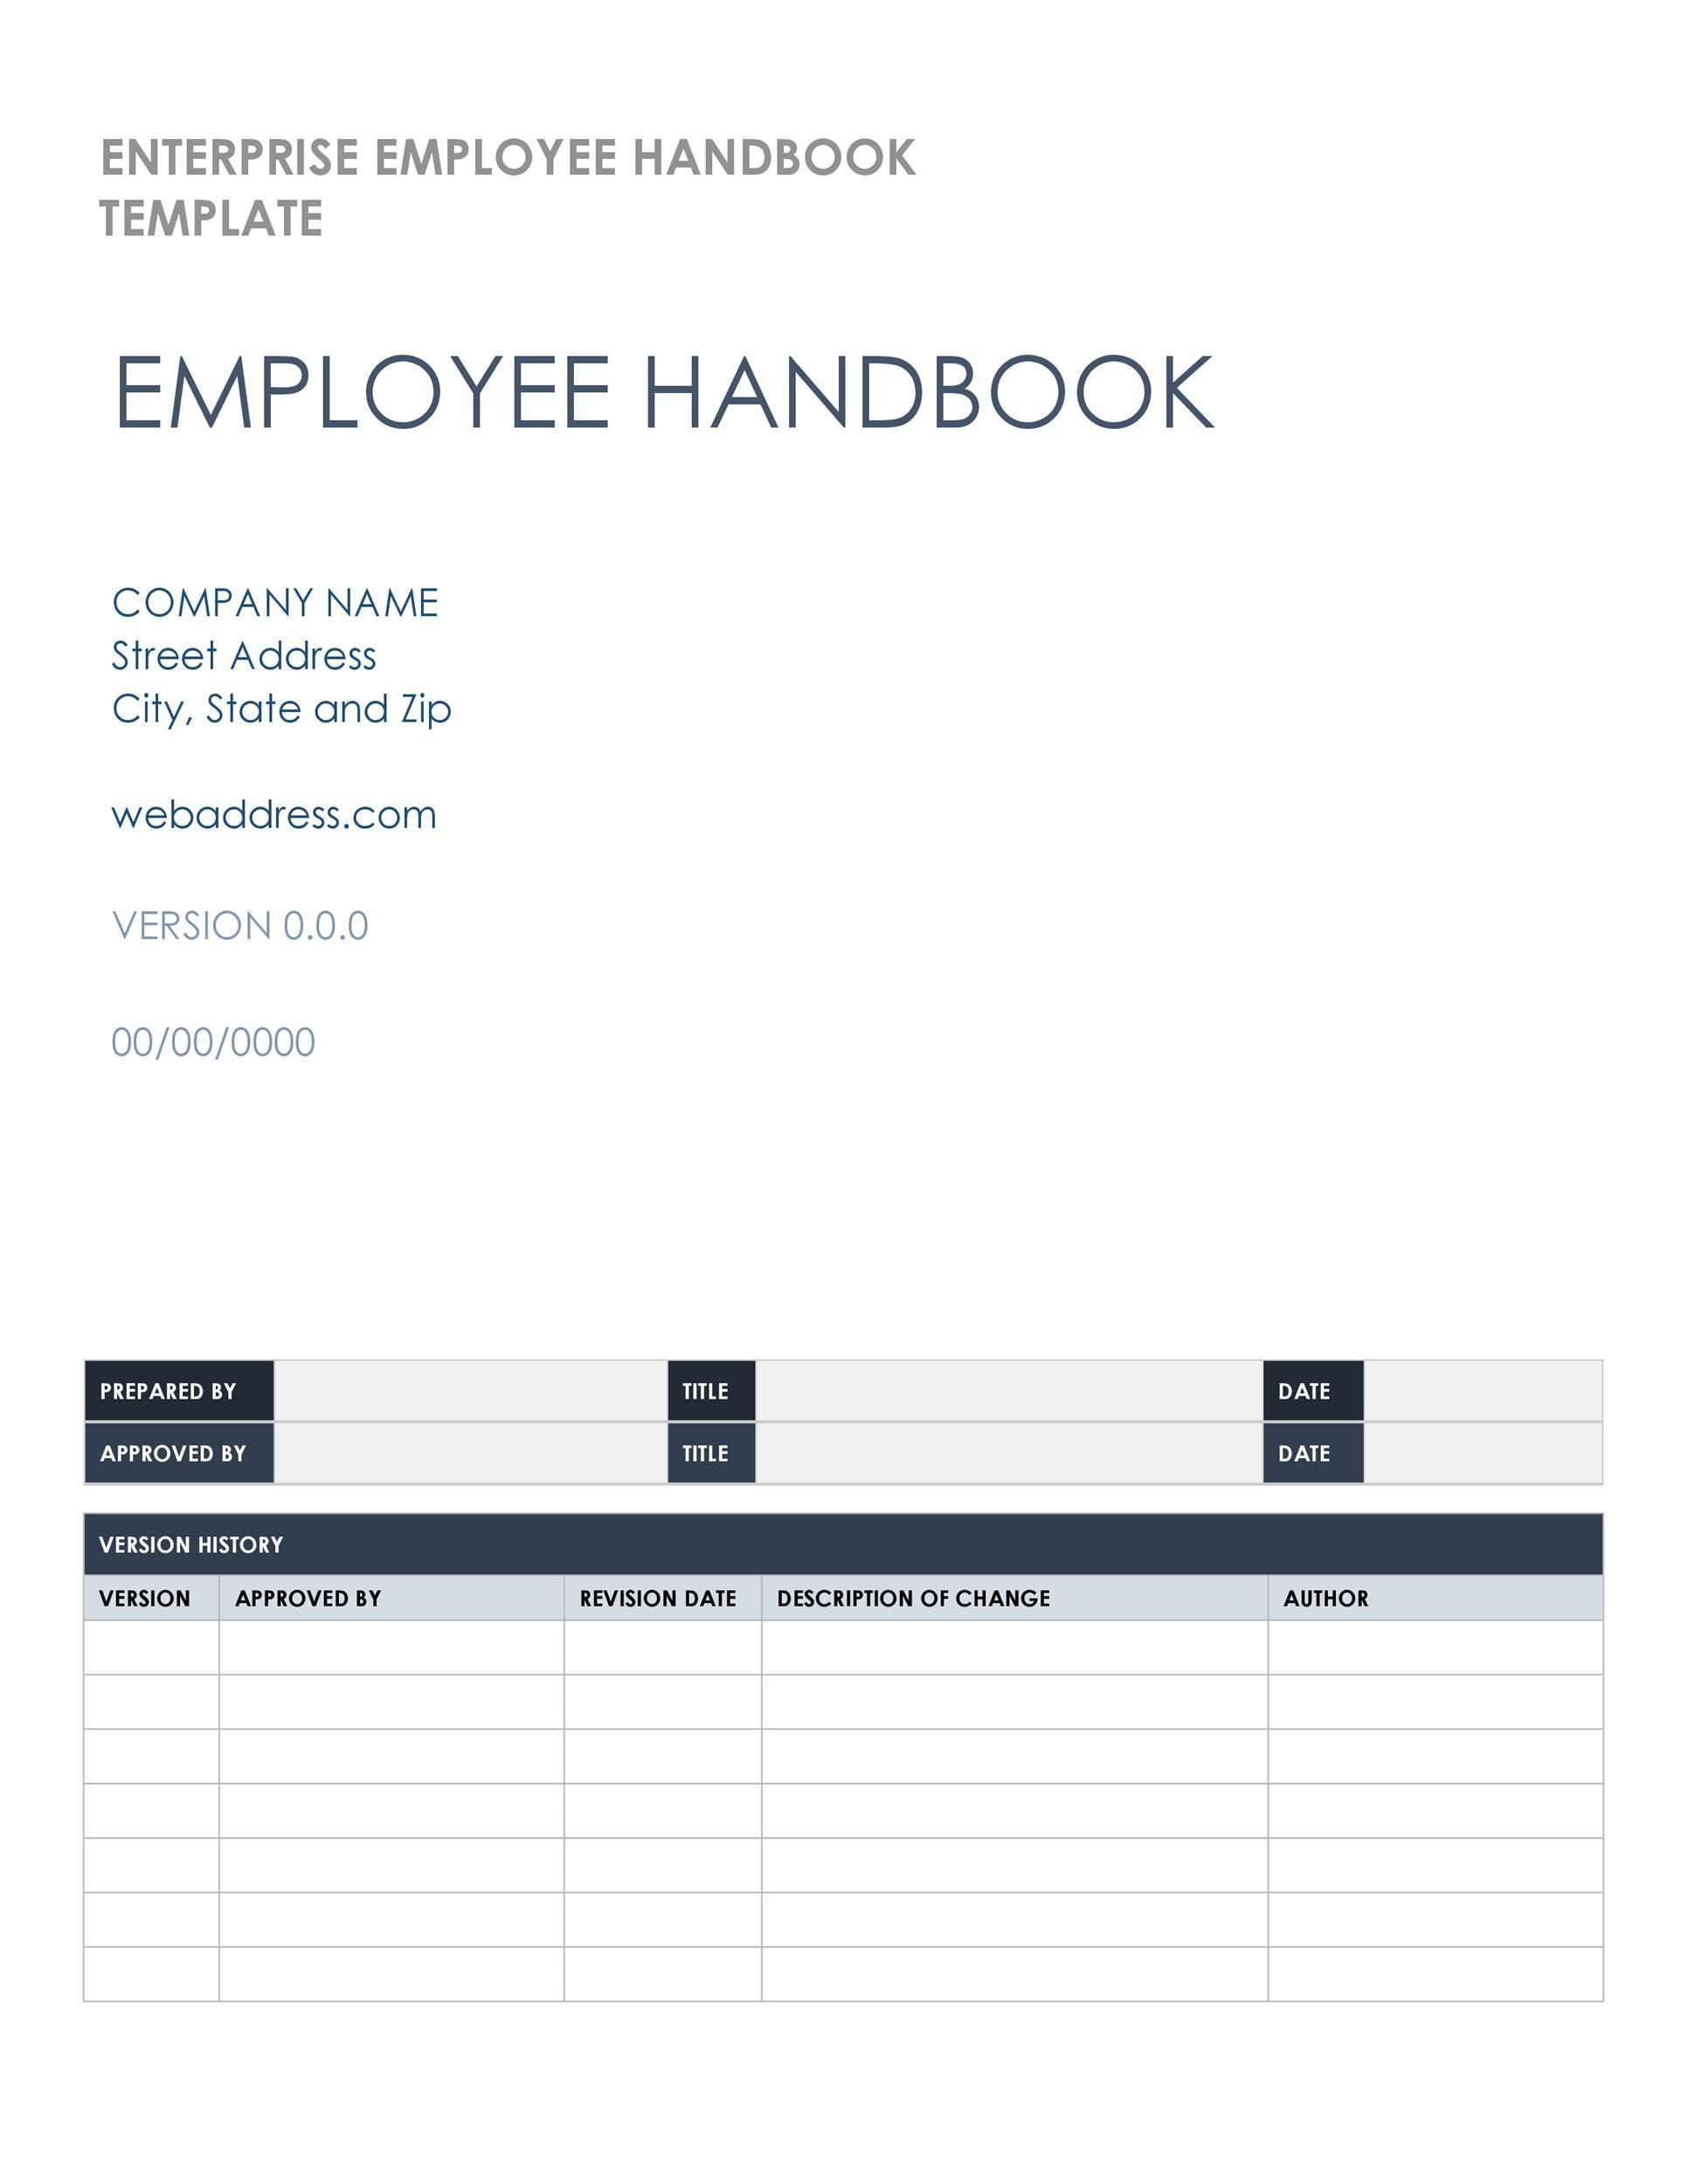 Free employee handbook template 09